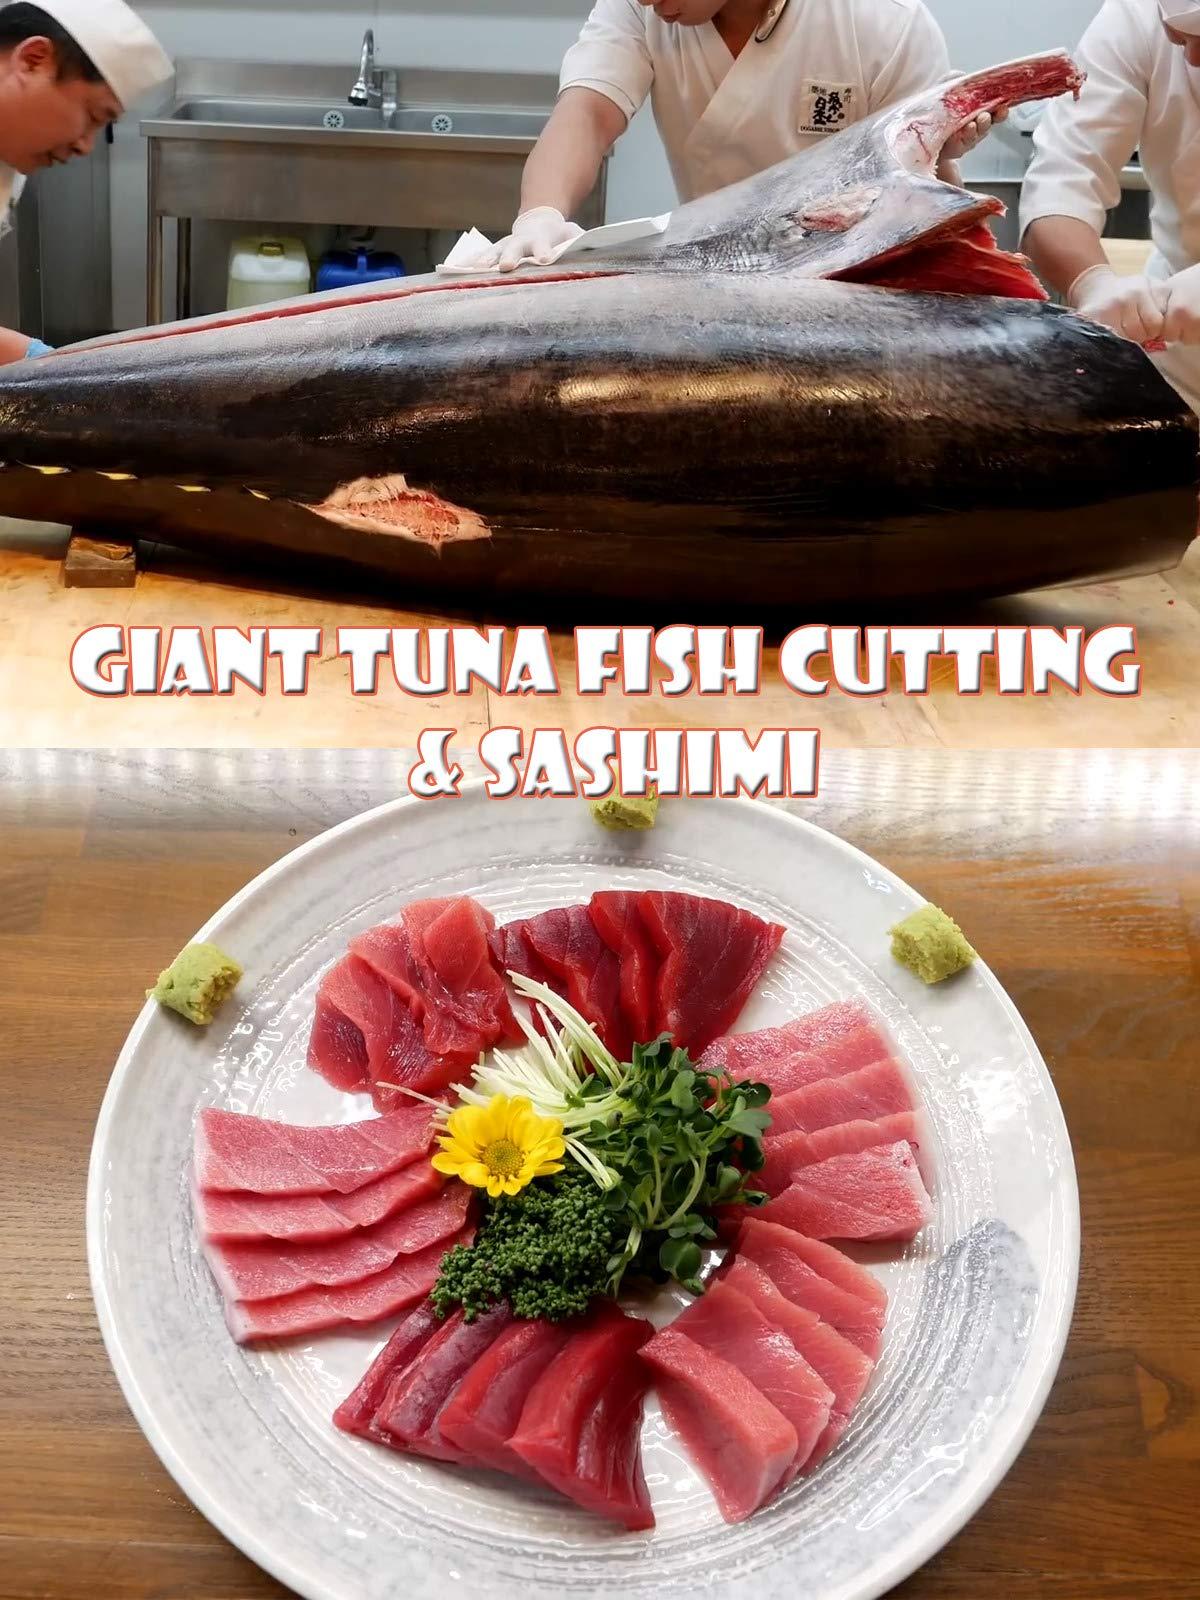 Clip: Giant Tuna Fish Cutting & Sashimi